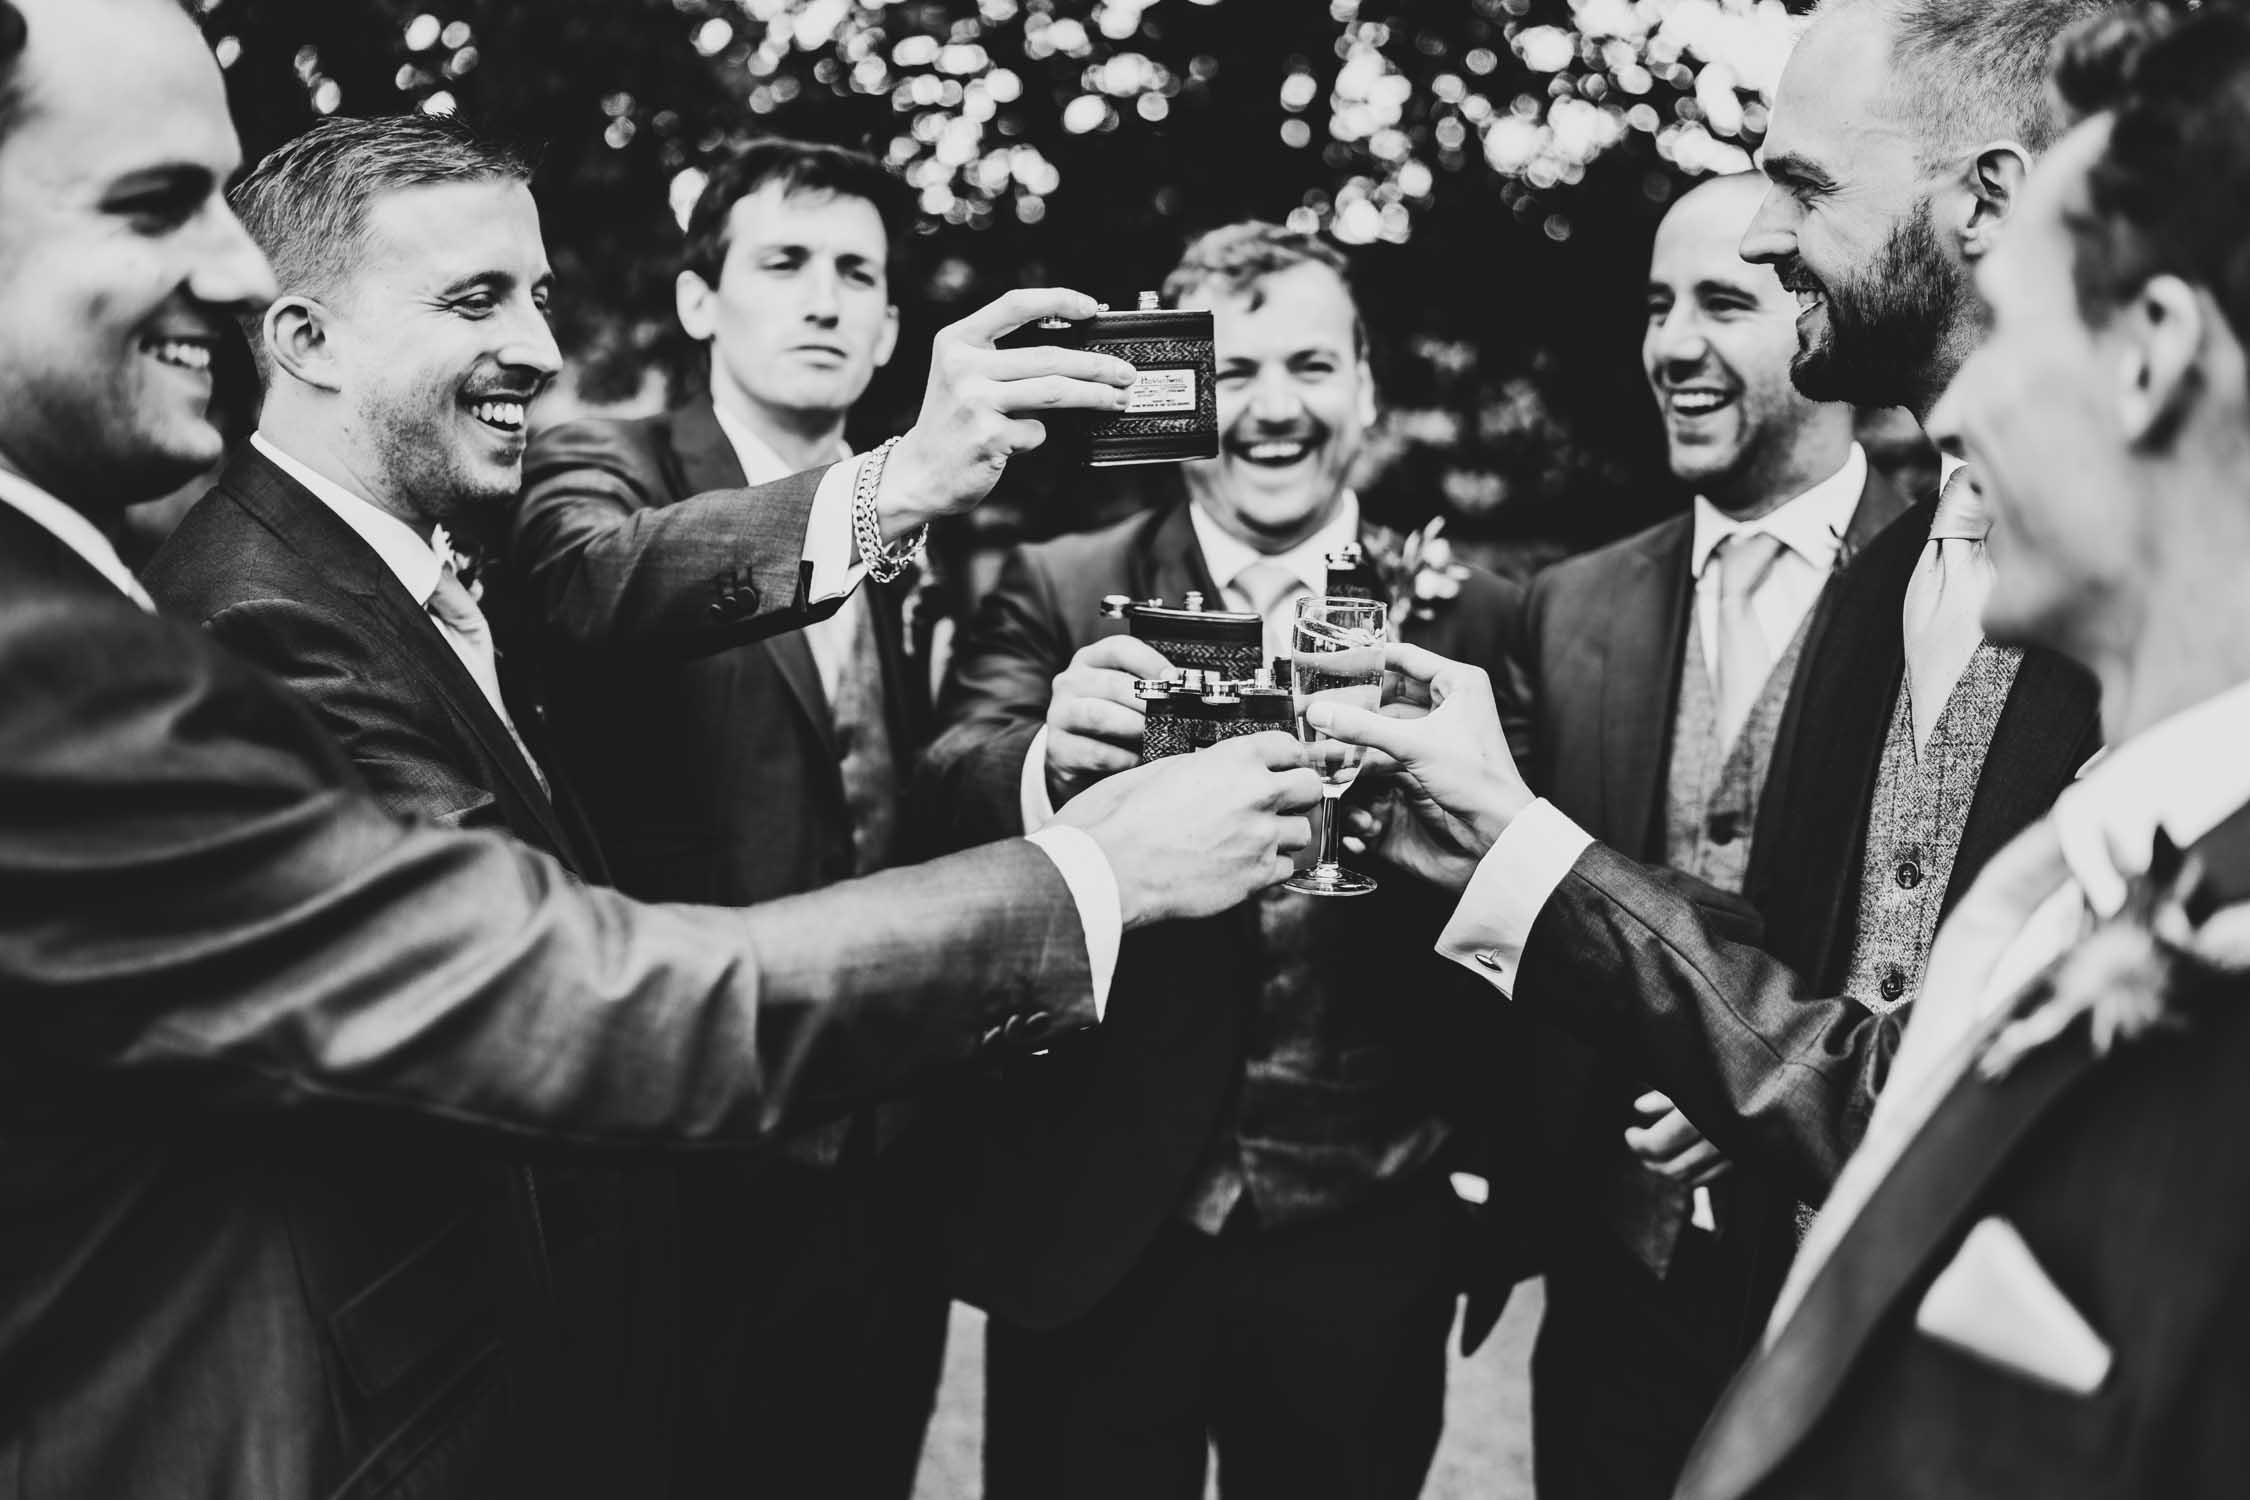 Lyde Court Wedding Photography, Wedding Photographer at Lyde Court, Lyde Court Herefordshire, Wedding venue in Herefordshire, Lyde Court Wedding